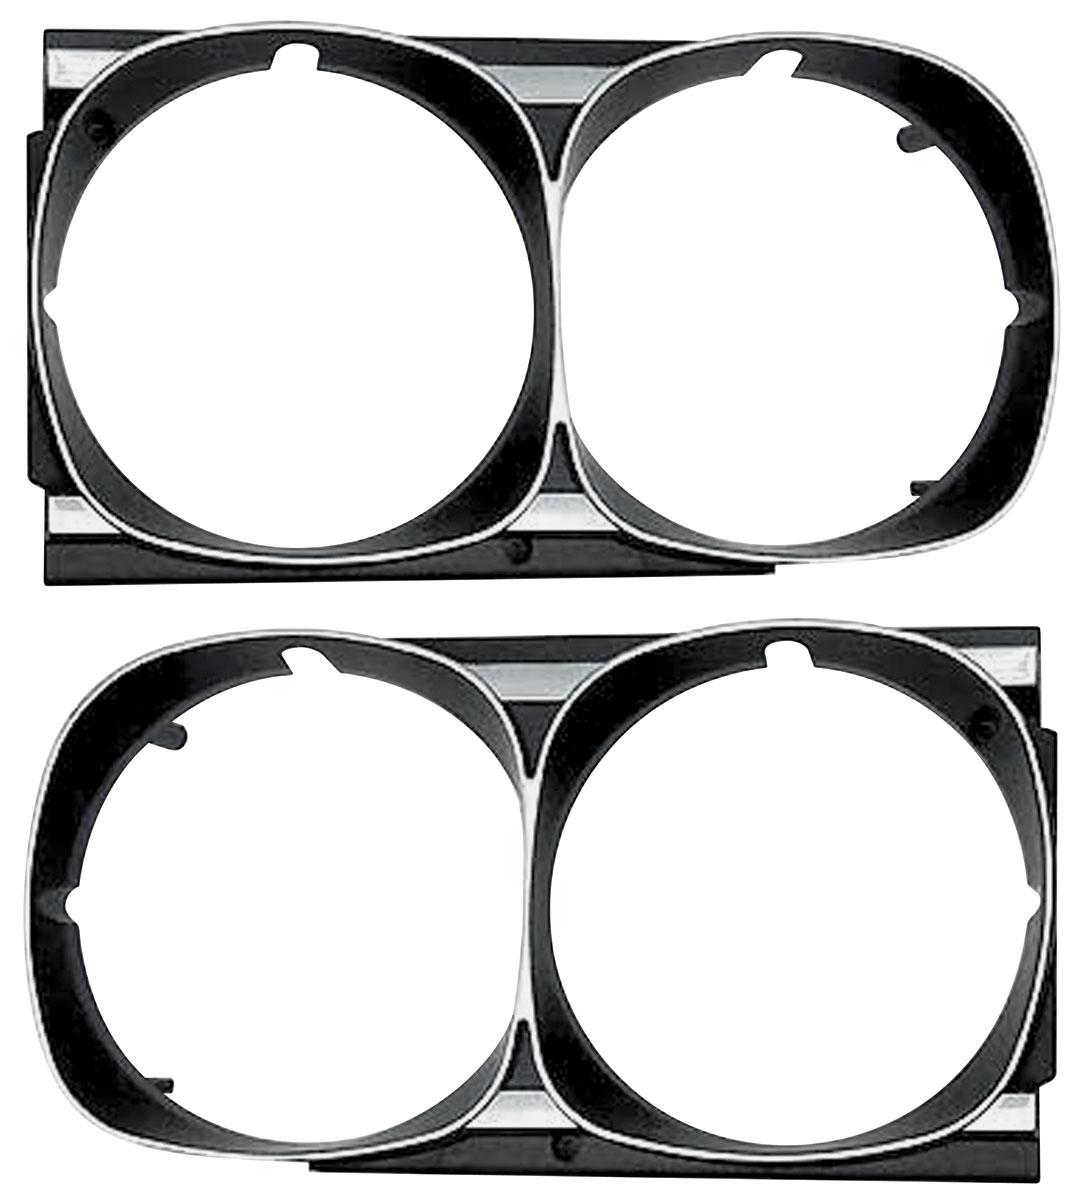 Bezels, Headlight, 1969 GTO/Tempest/LeMans, Non-Hideaway